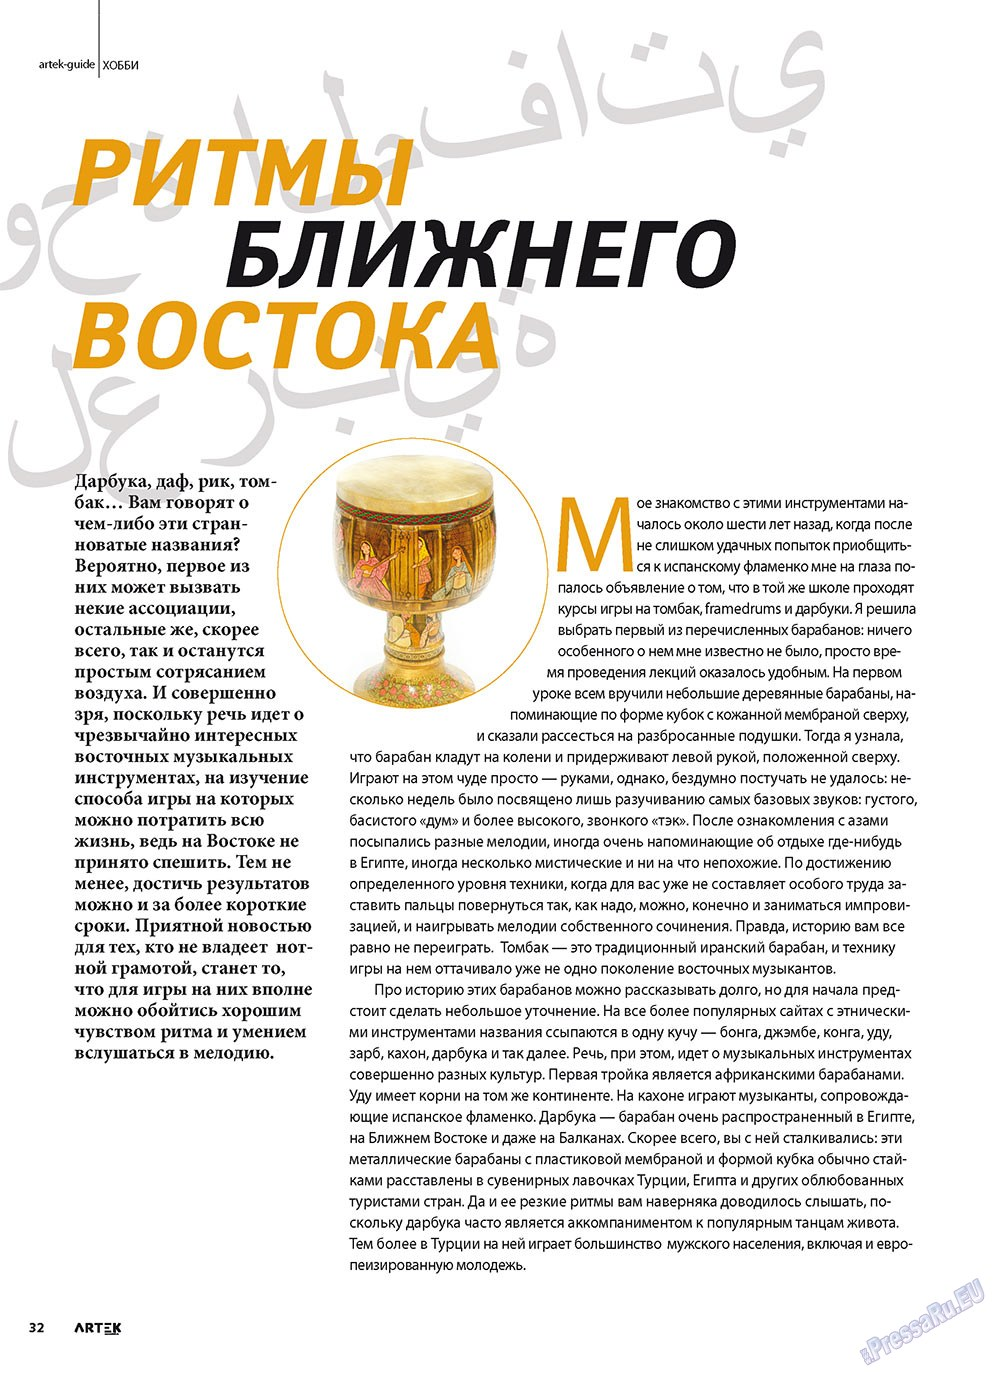 Артек (журнал). 2011 год, номер 2, стр. 34